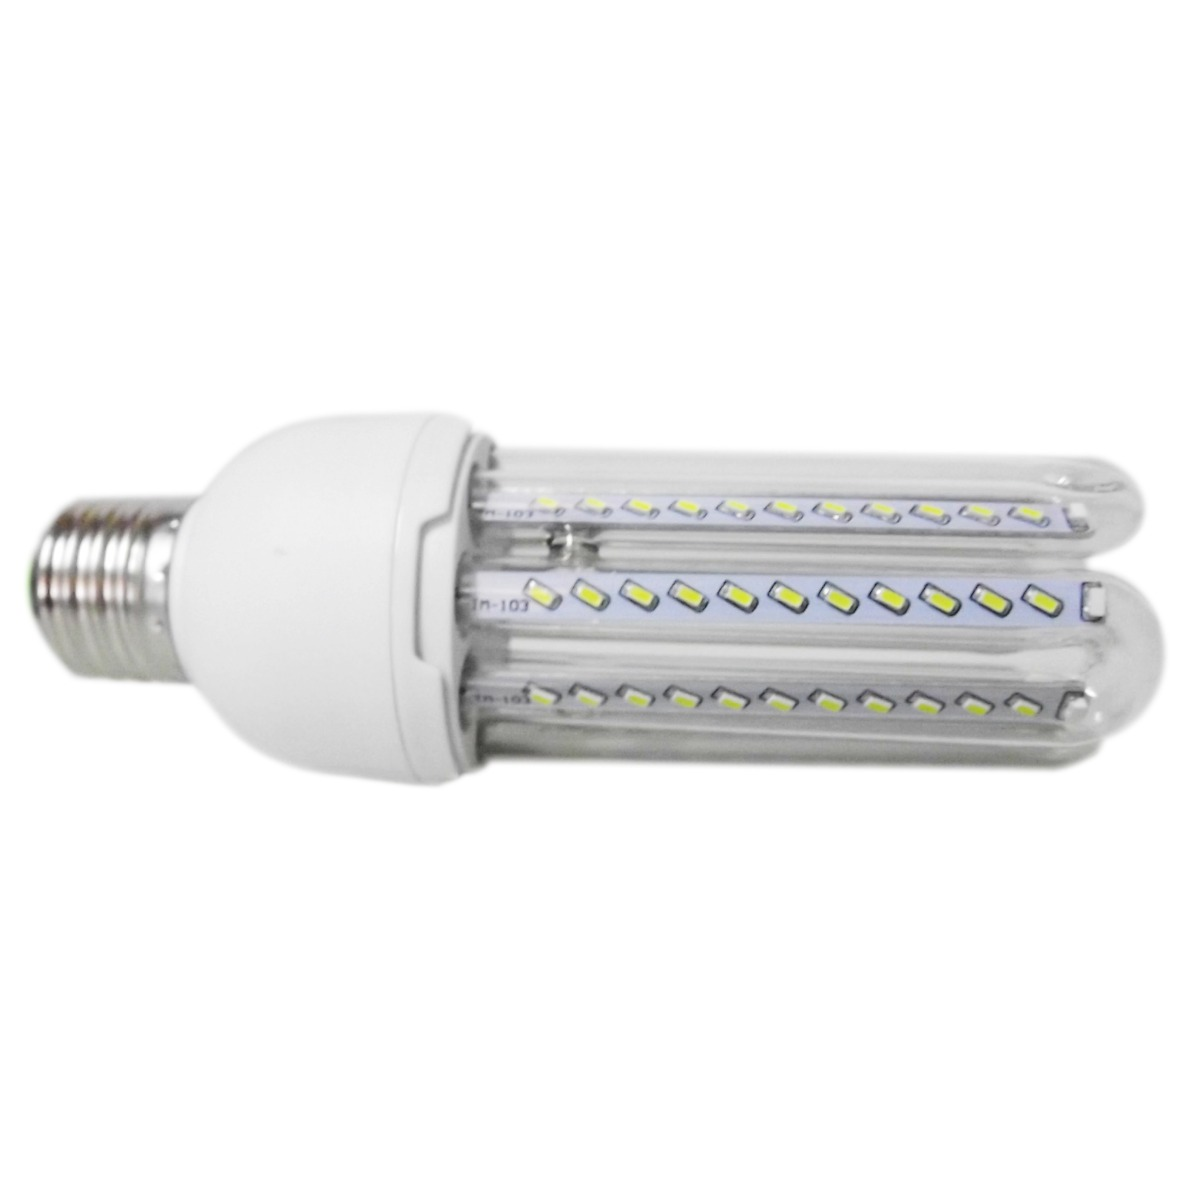 Kit 10 lampada led 7w lampadas original bivolt 110v a 220v for Lampada led